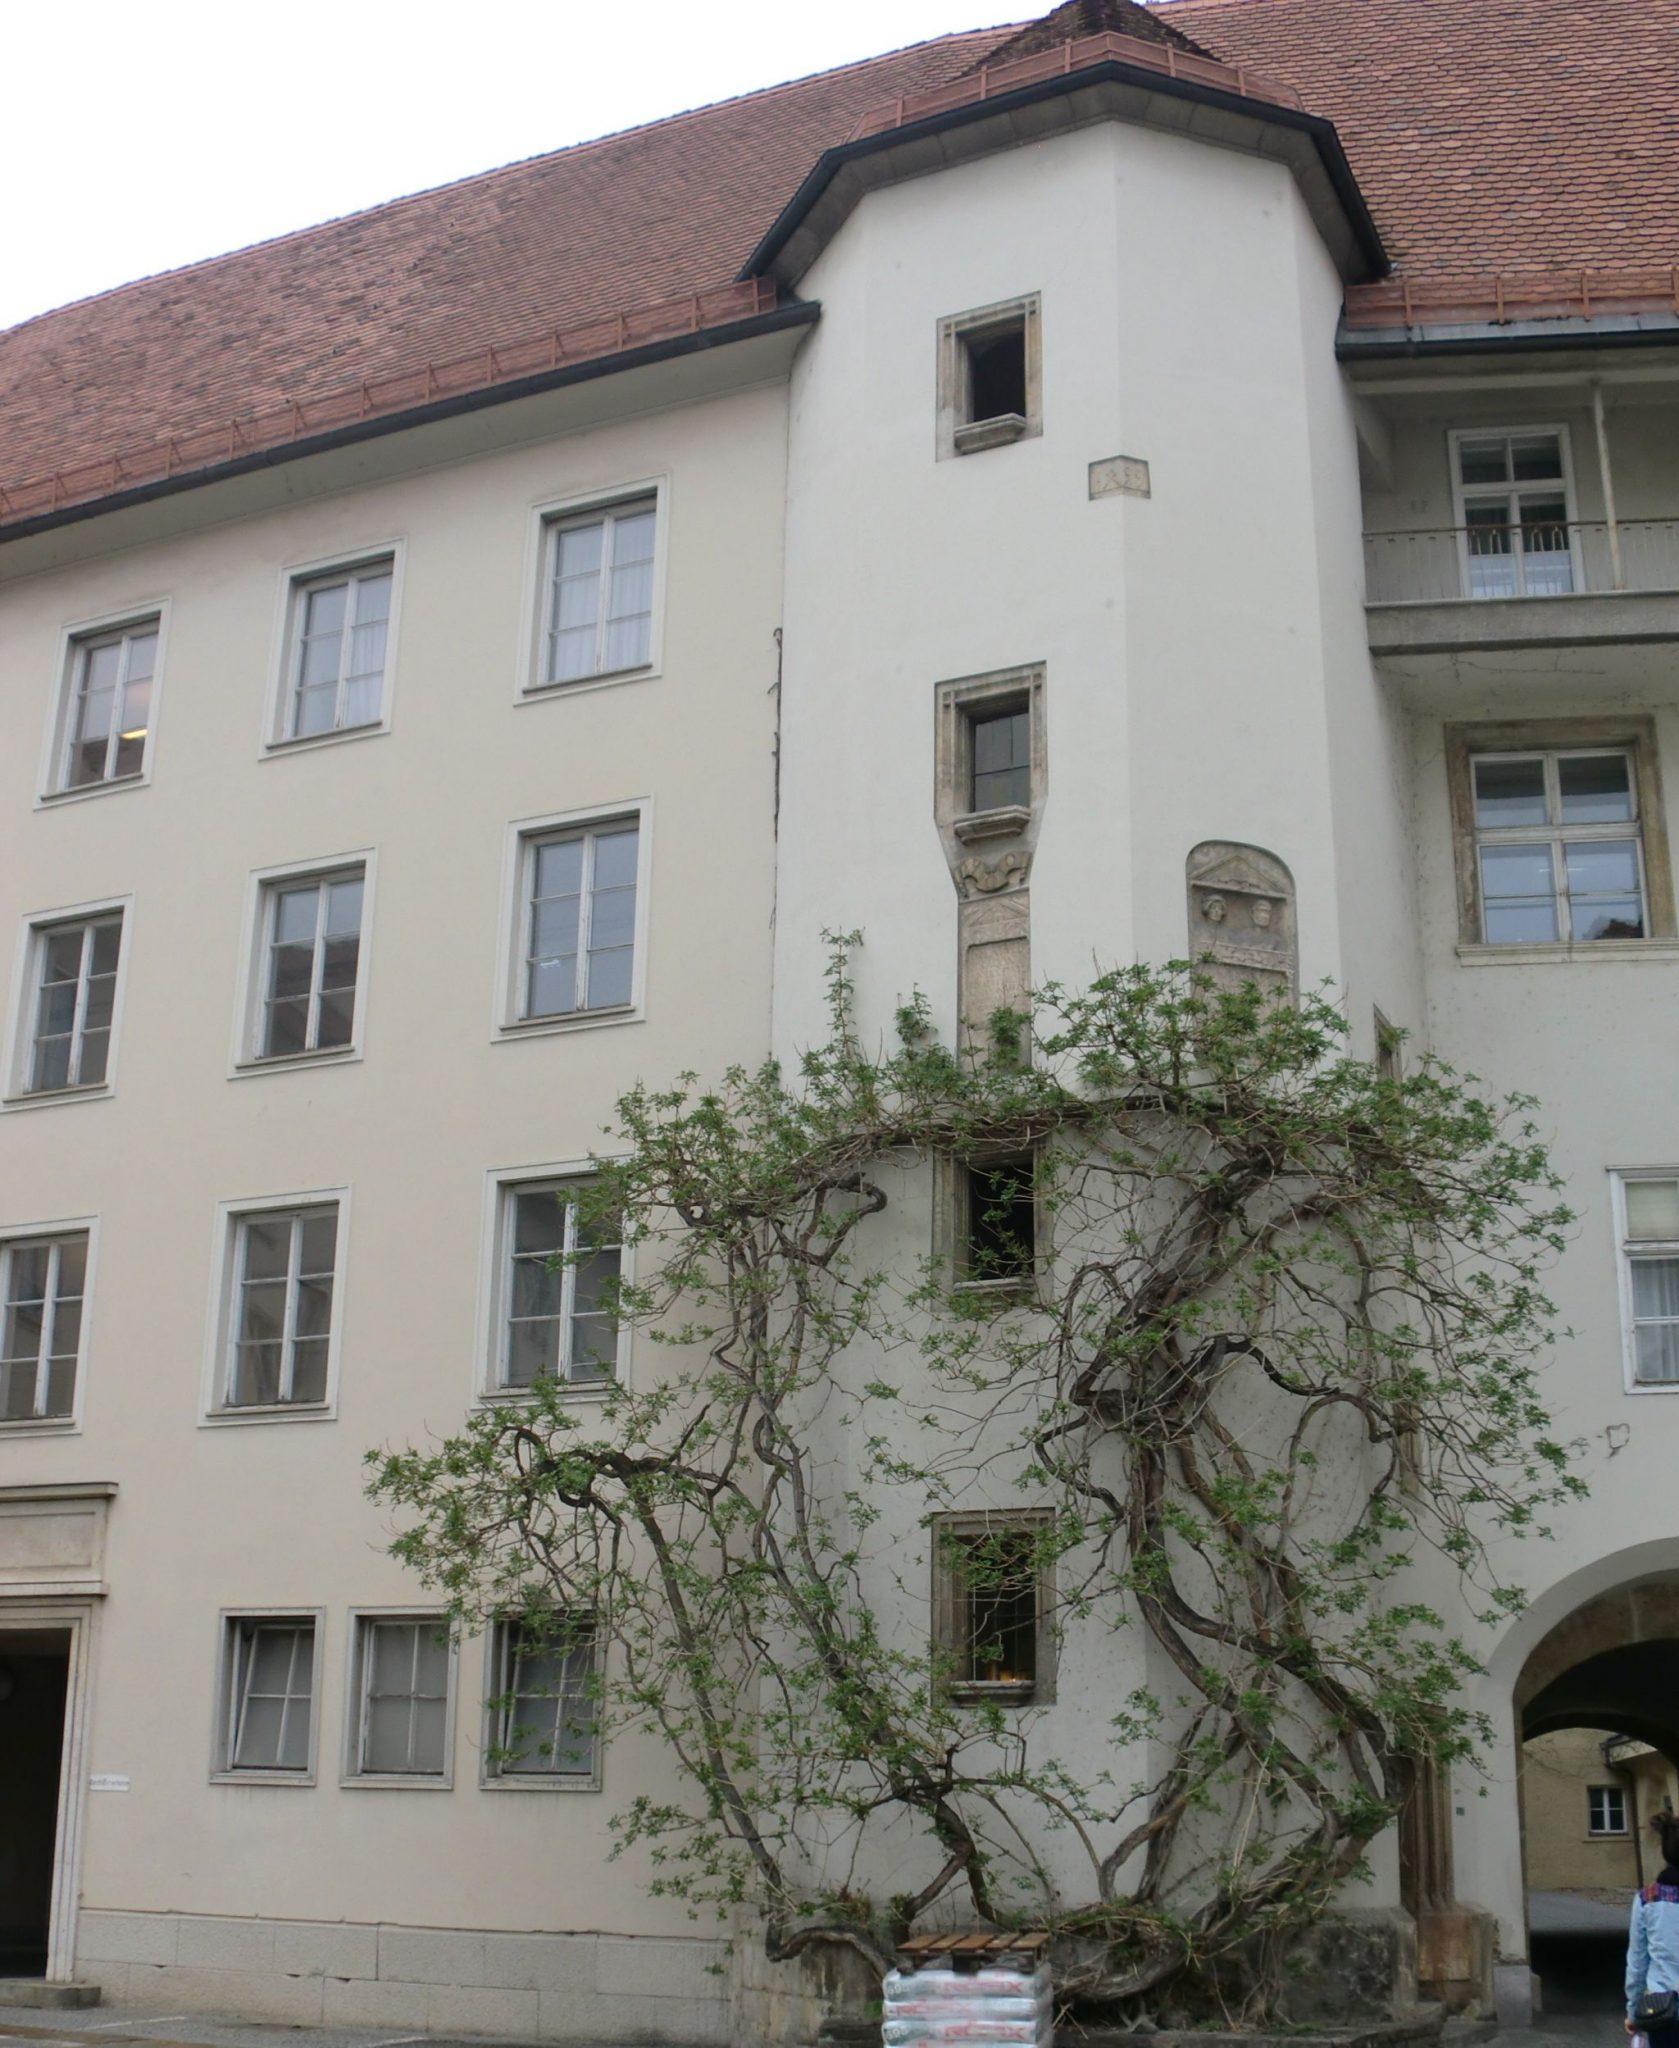 Graz region 0 - Graz: tradition and modernity